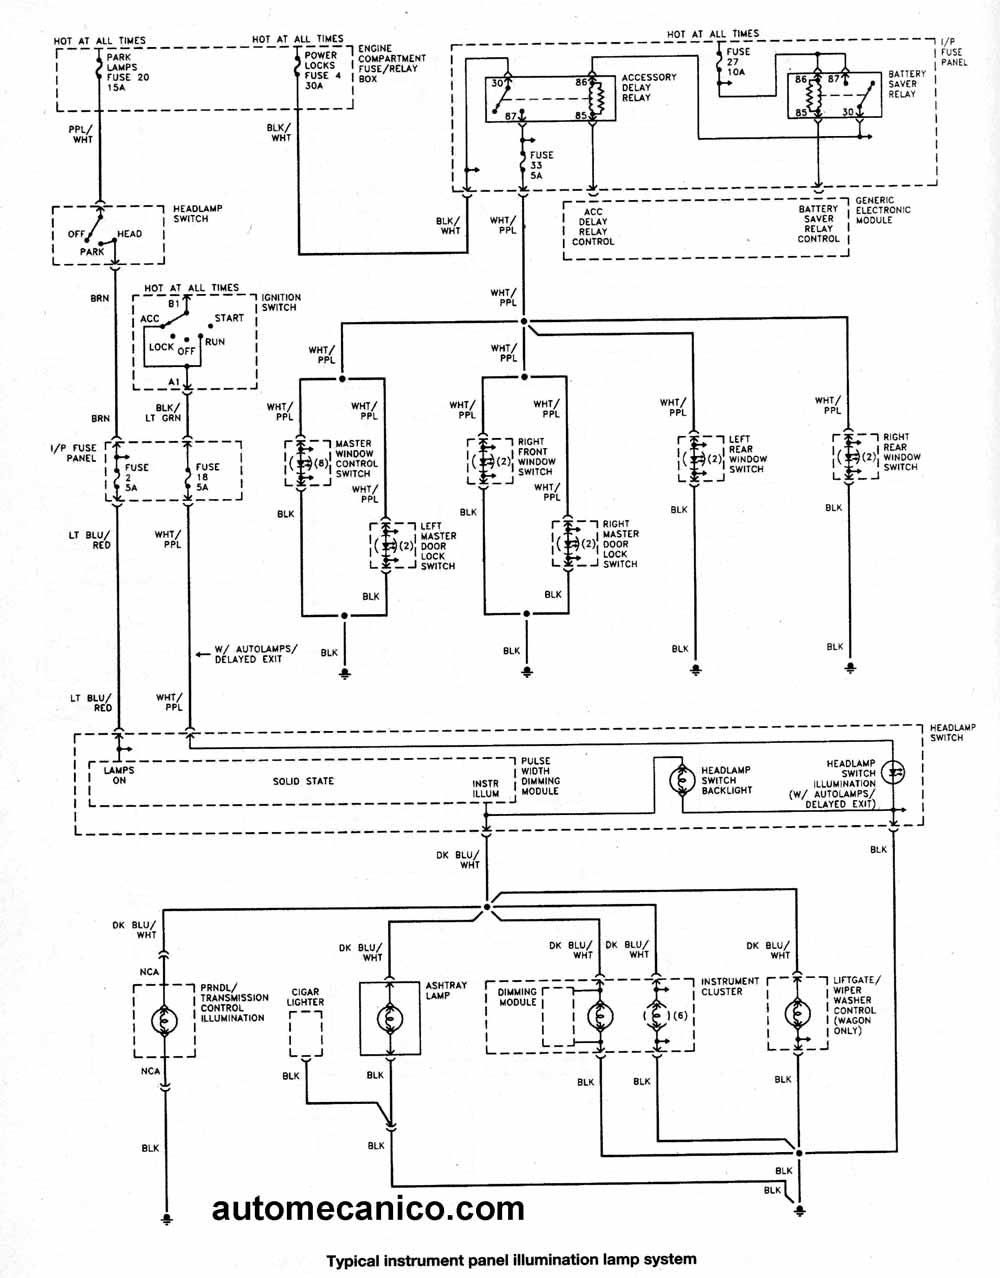 2003 Ford Windstar Manual Fuse